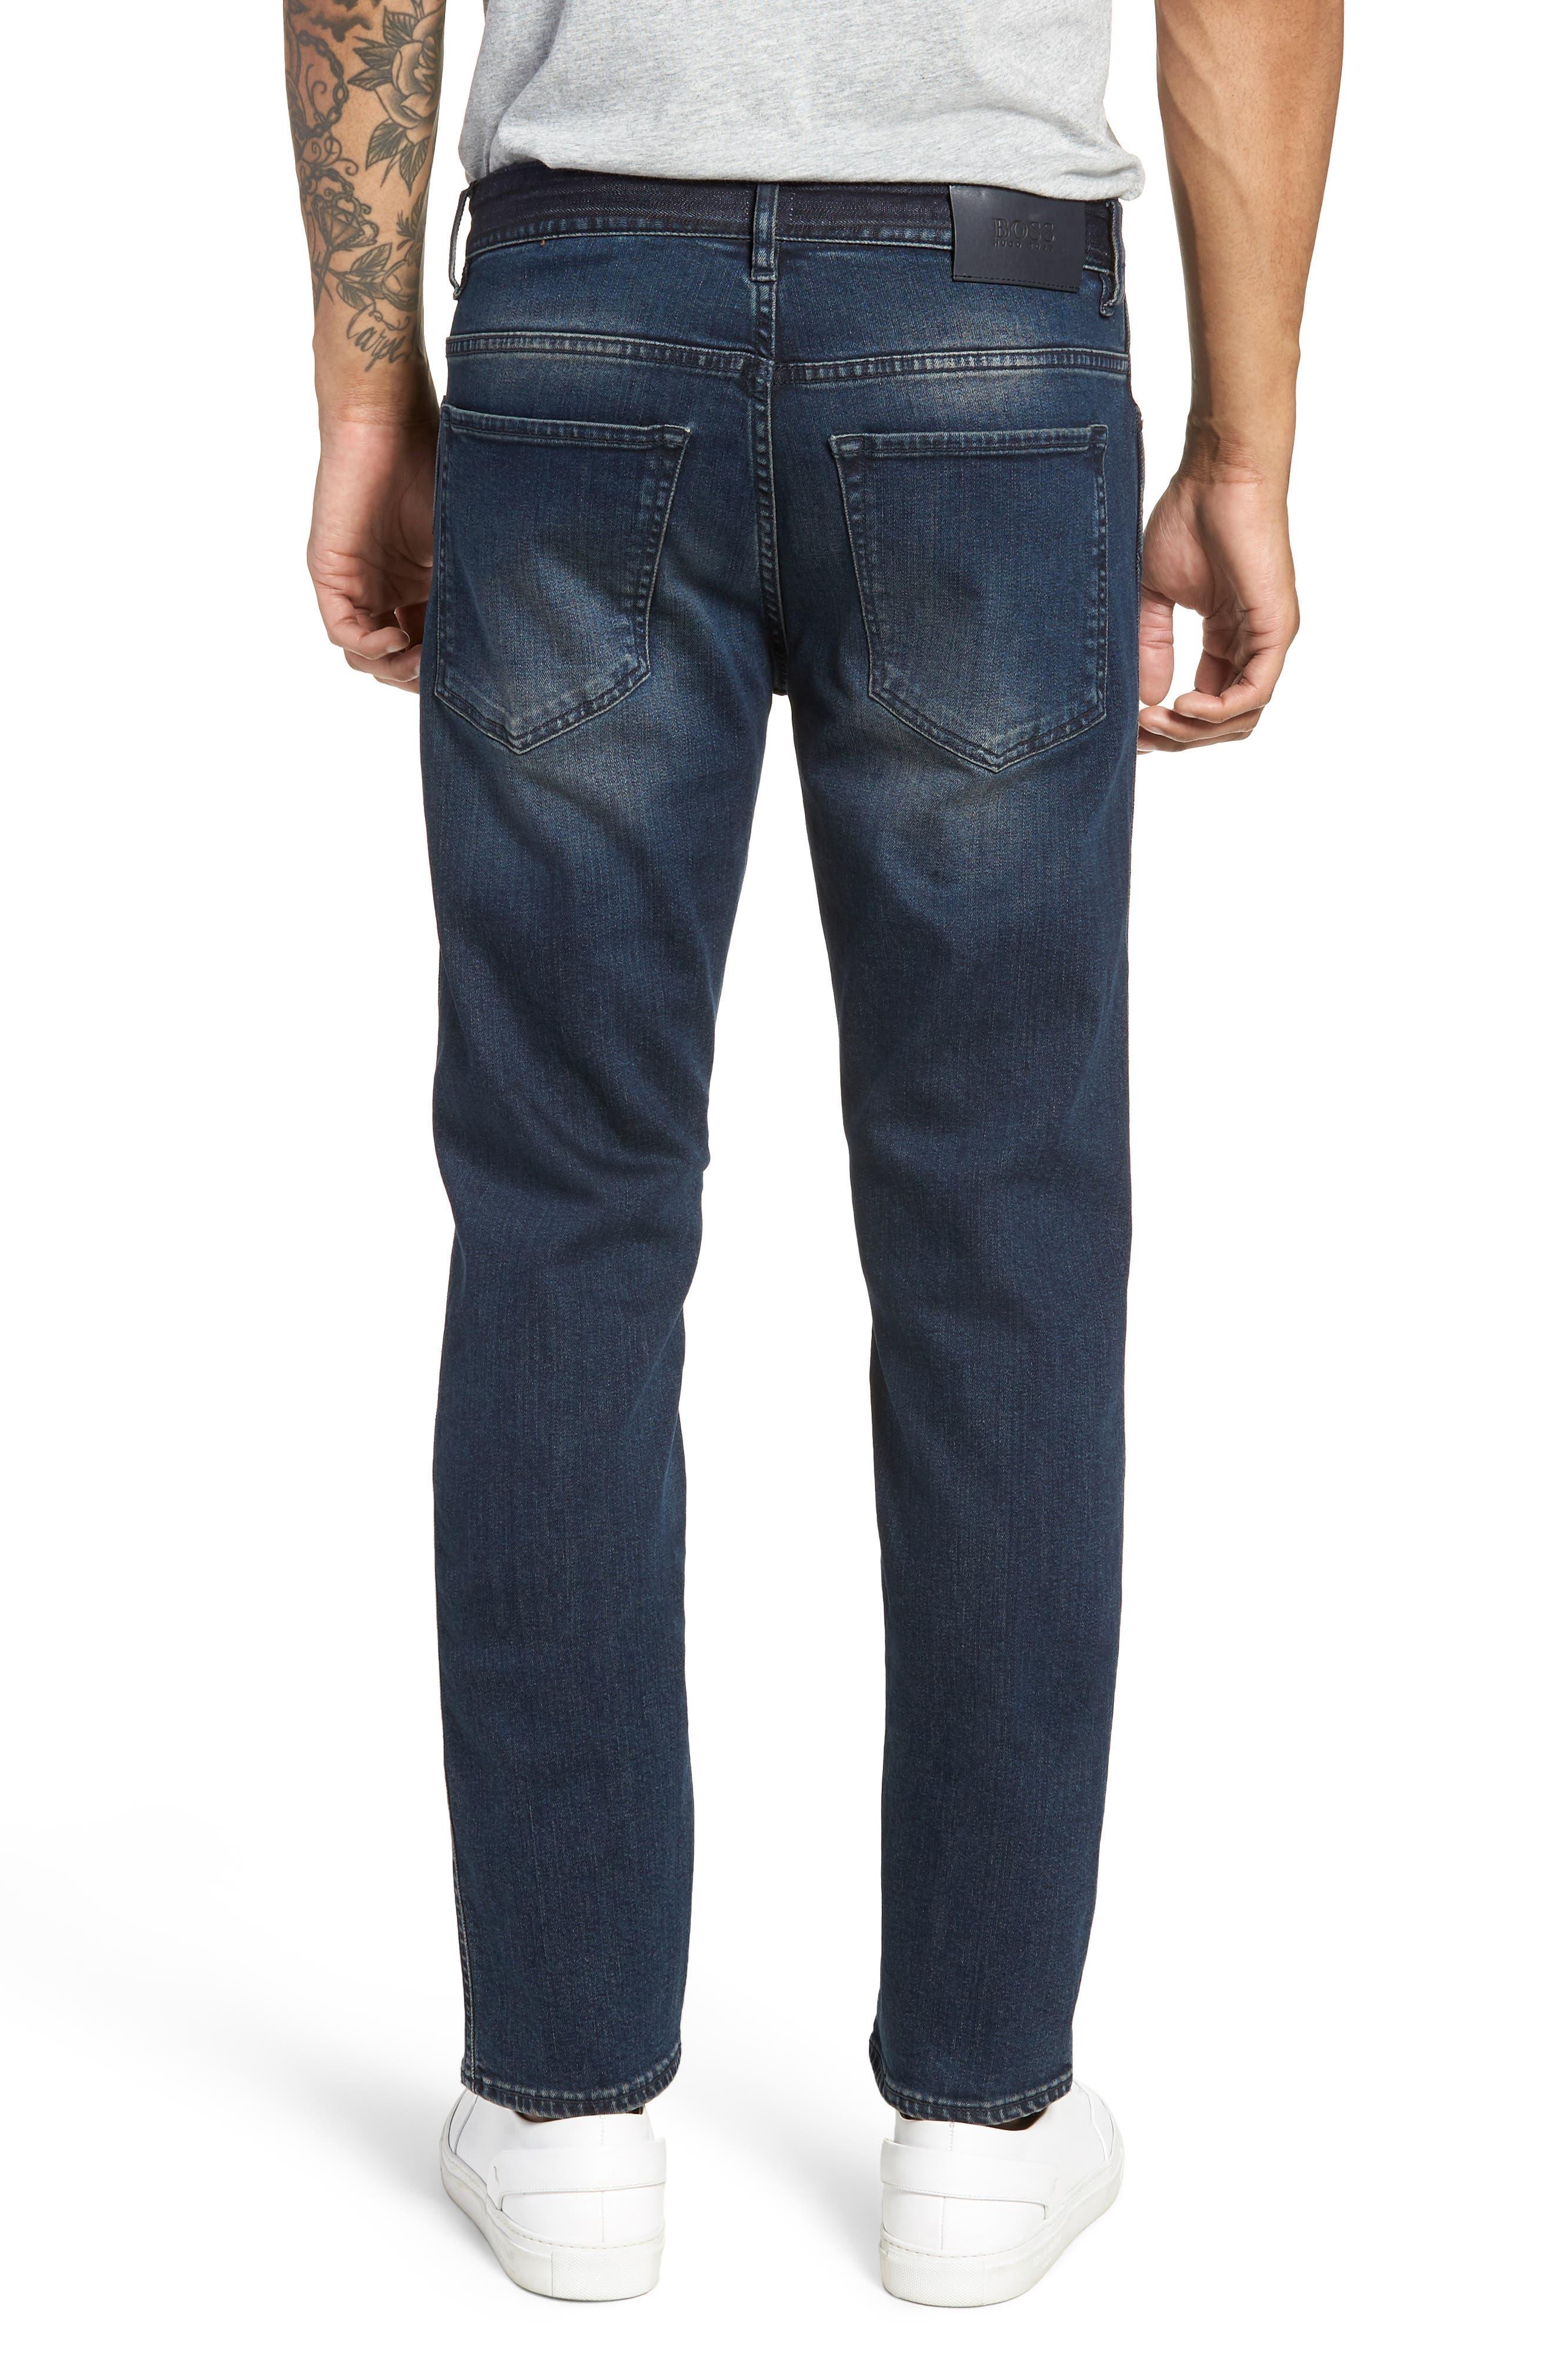 Delaware Slim Fit Jeans,                             Alternate thumbnail 2, color,                             Blue